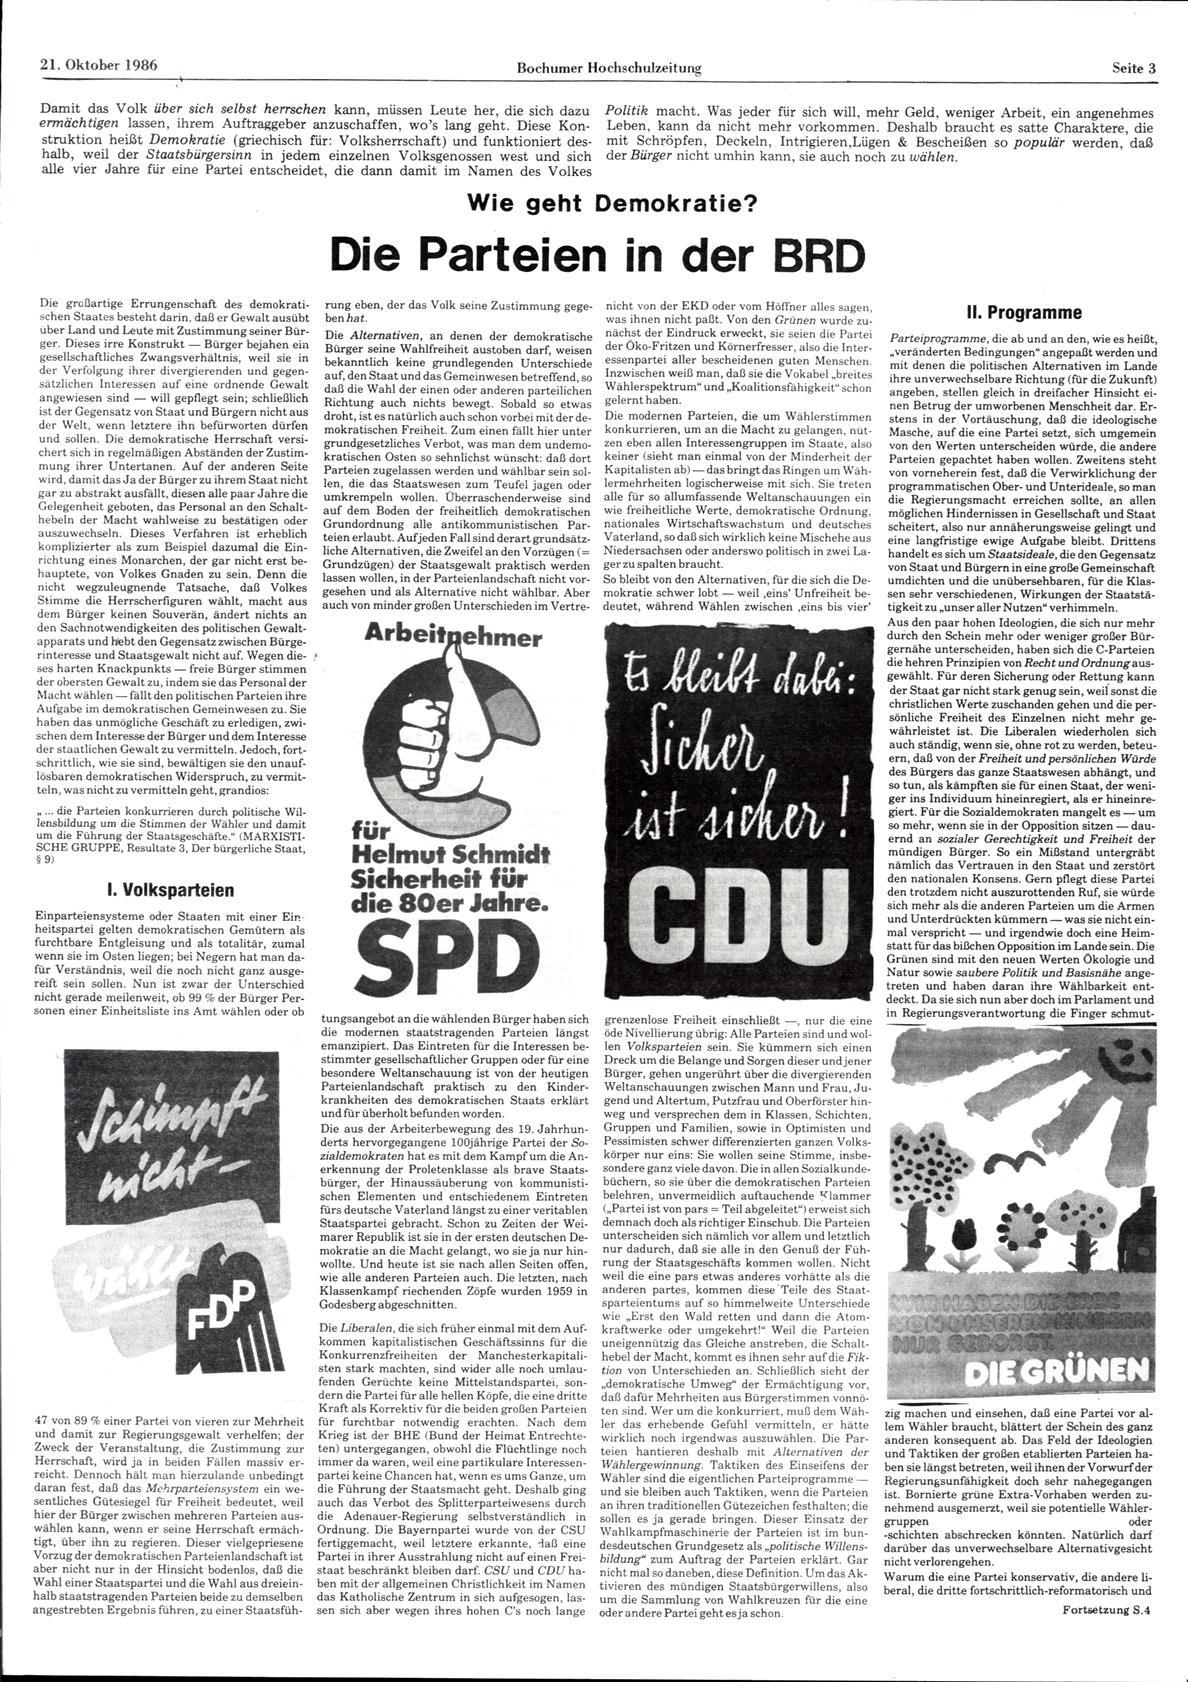 Bochum_BHZ_19861021_136_003